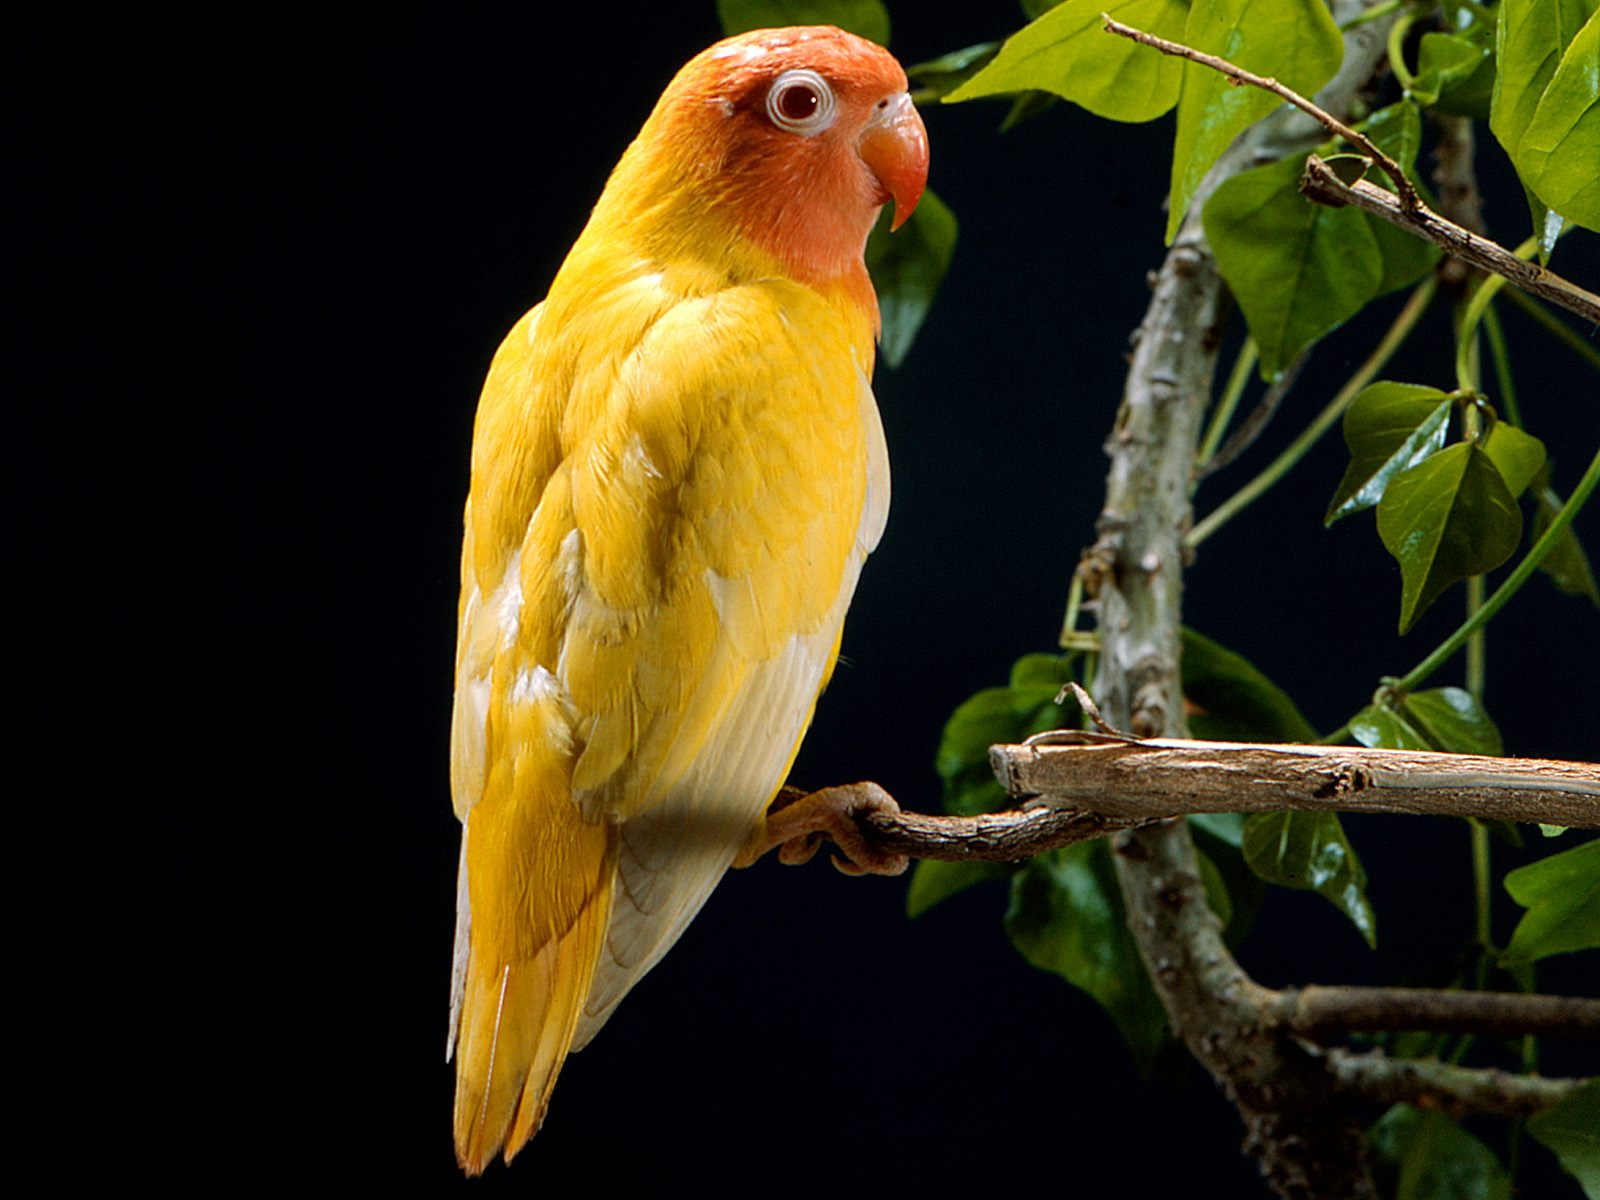 Wallpaper Gallery Love Bird Wallpaper: See Animal And Birds: Love Bird Wallpaper